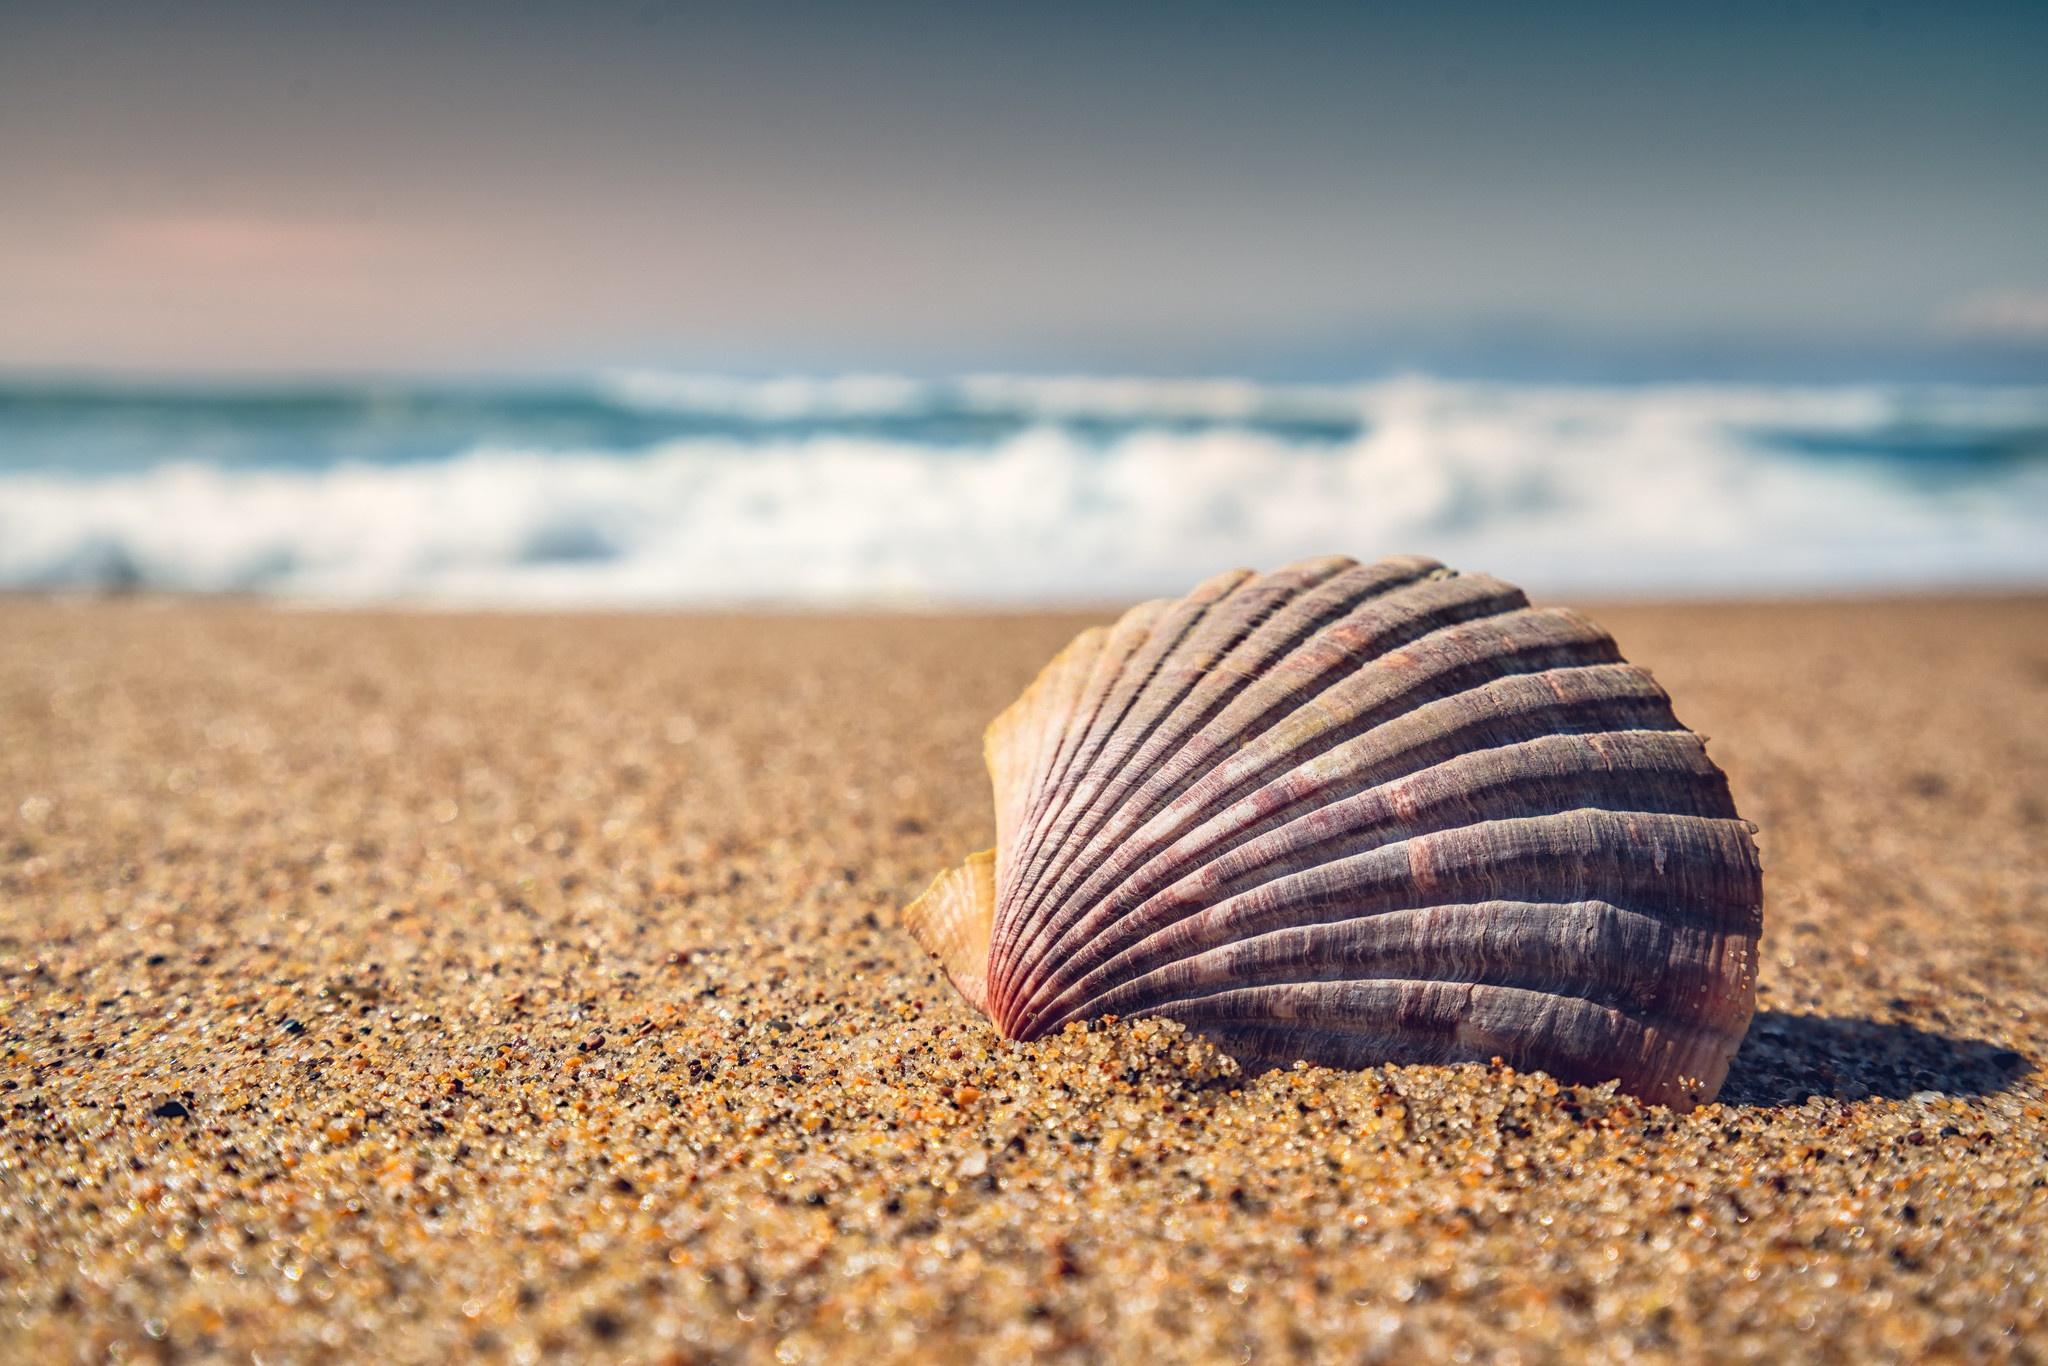 Macro Sand Shell 2048x1366